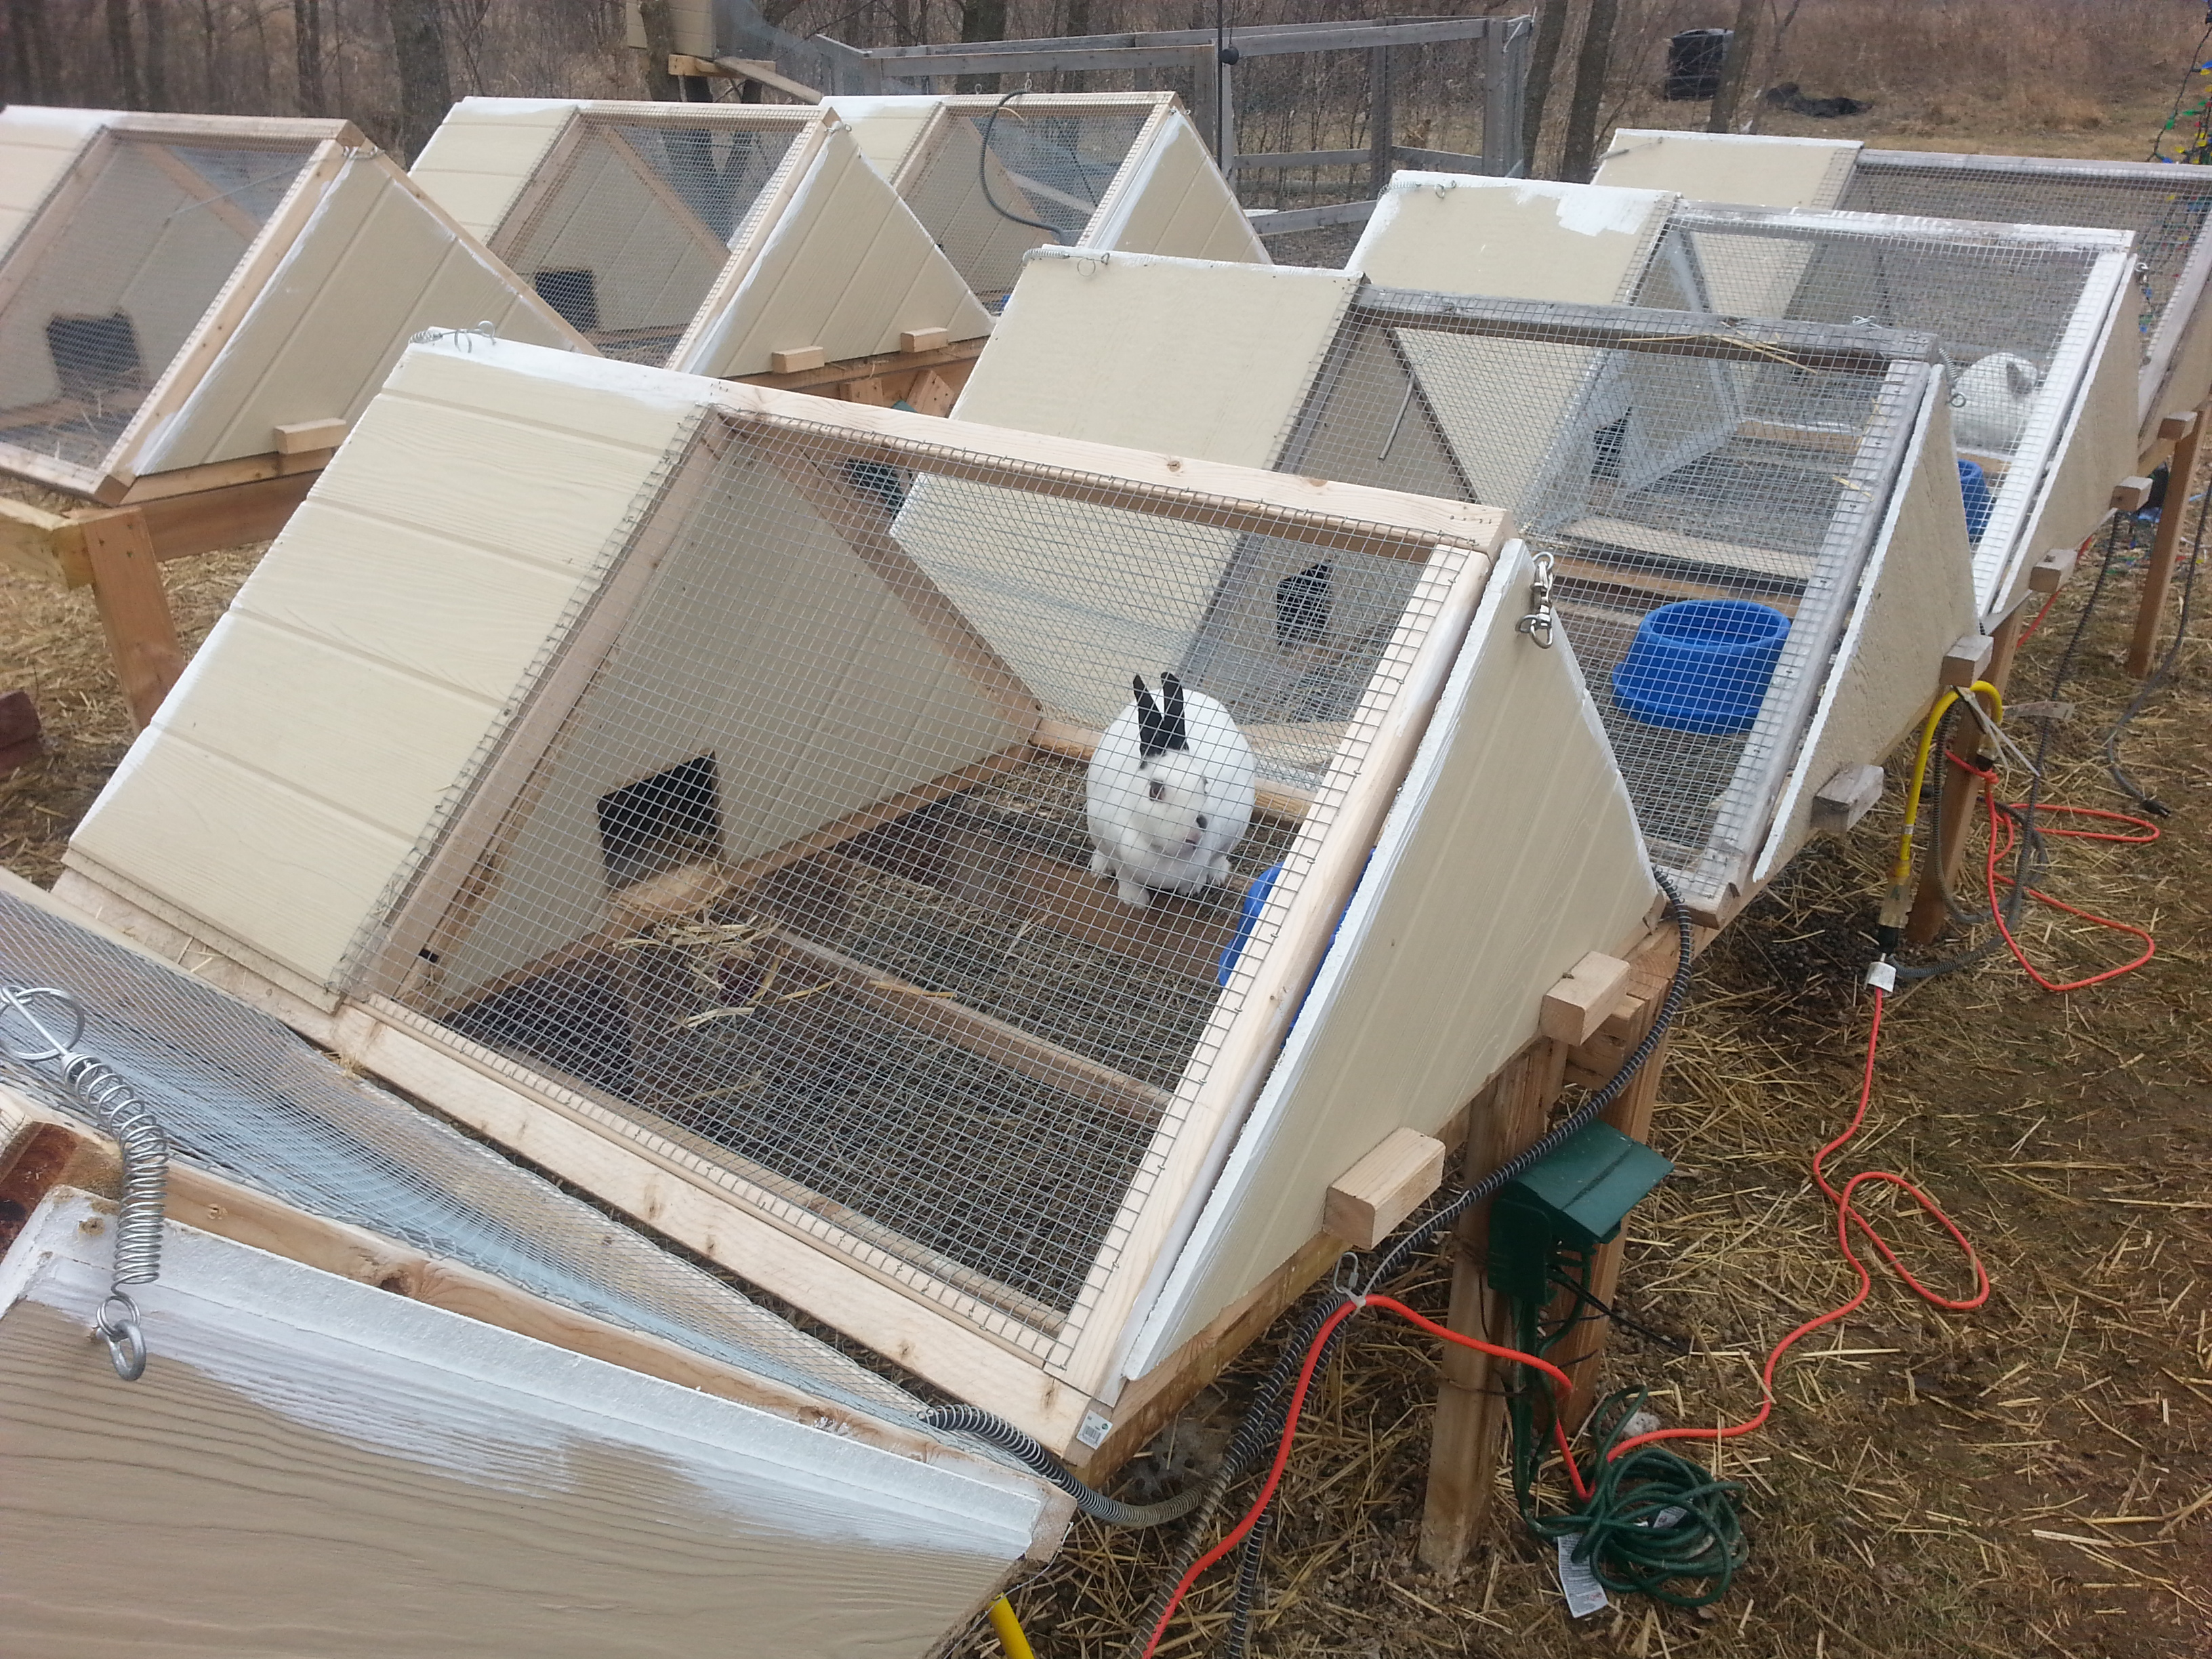 Super great A-frame rabbit hutch!